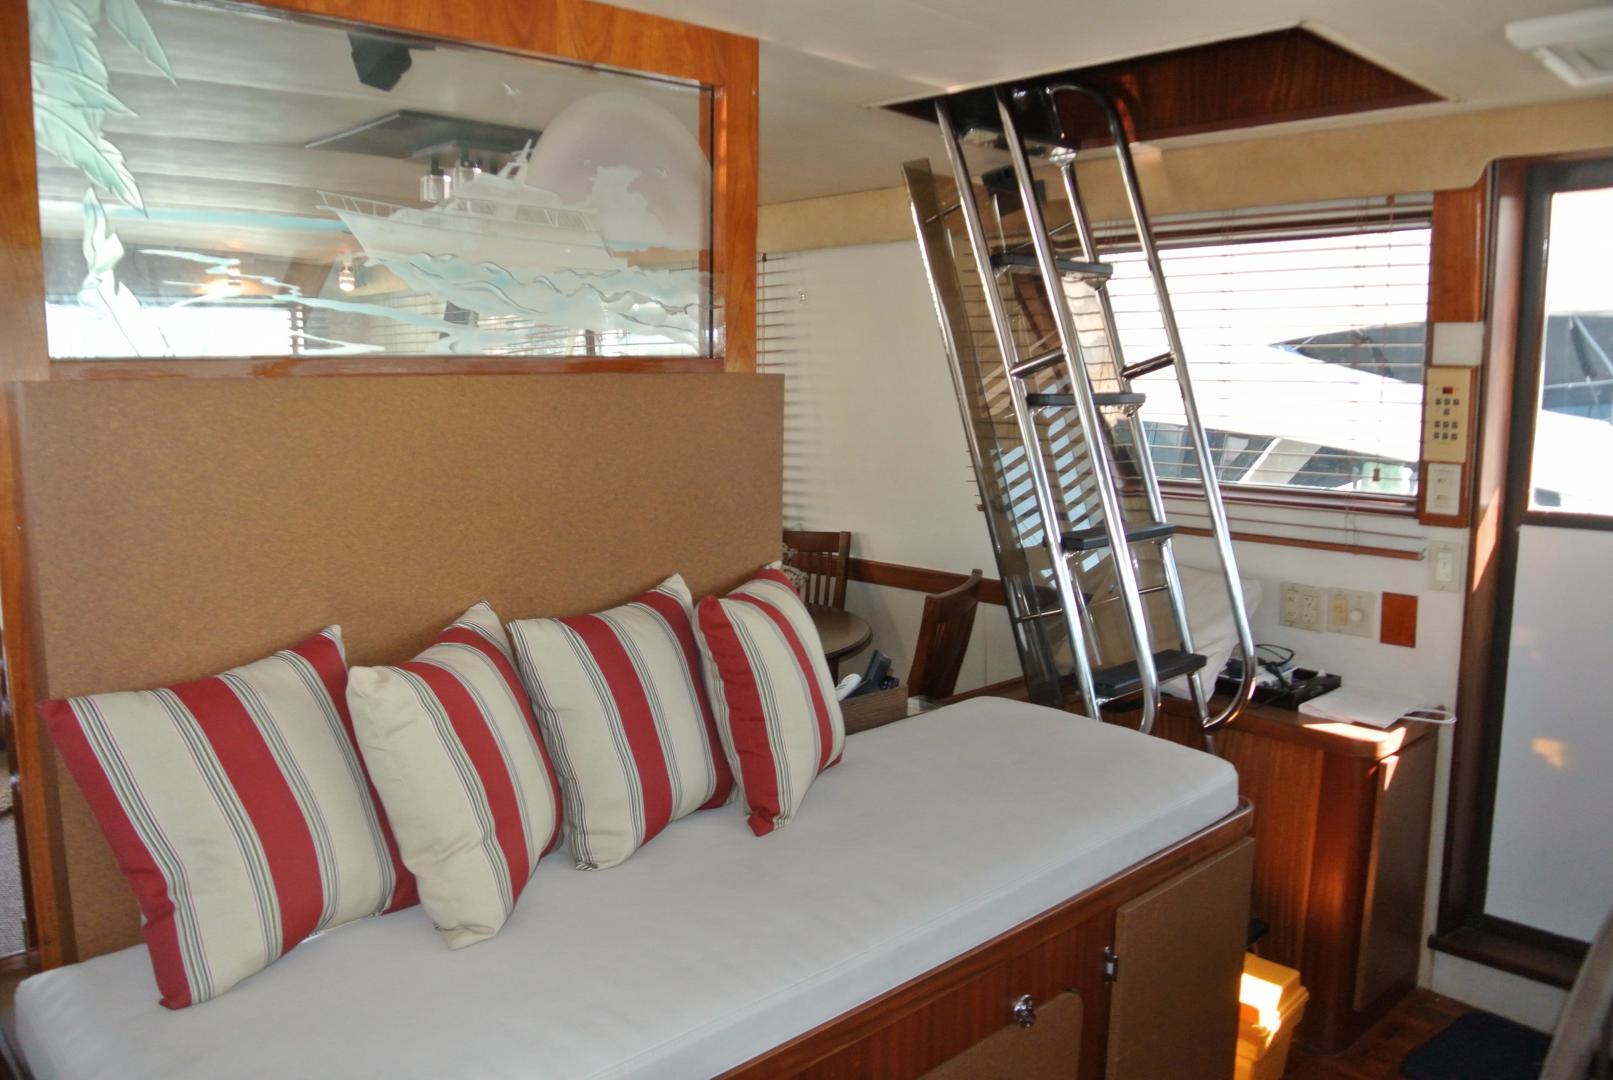 Hatteras-67-Cockpit-Motor-Yacht-1988-Lady-Encore-Saint-Petersburg-Florida-United-States-Wheel-House-926191